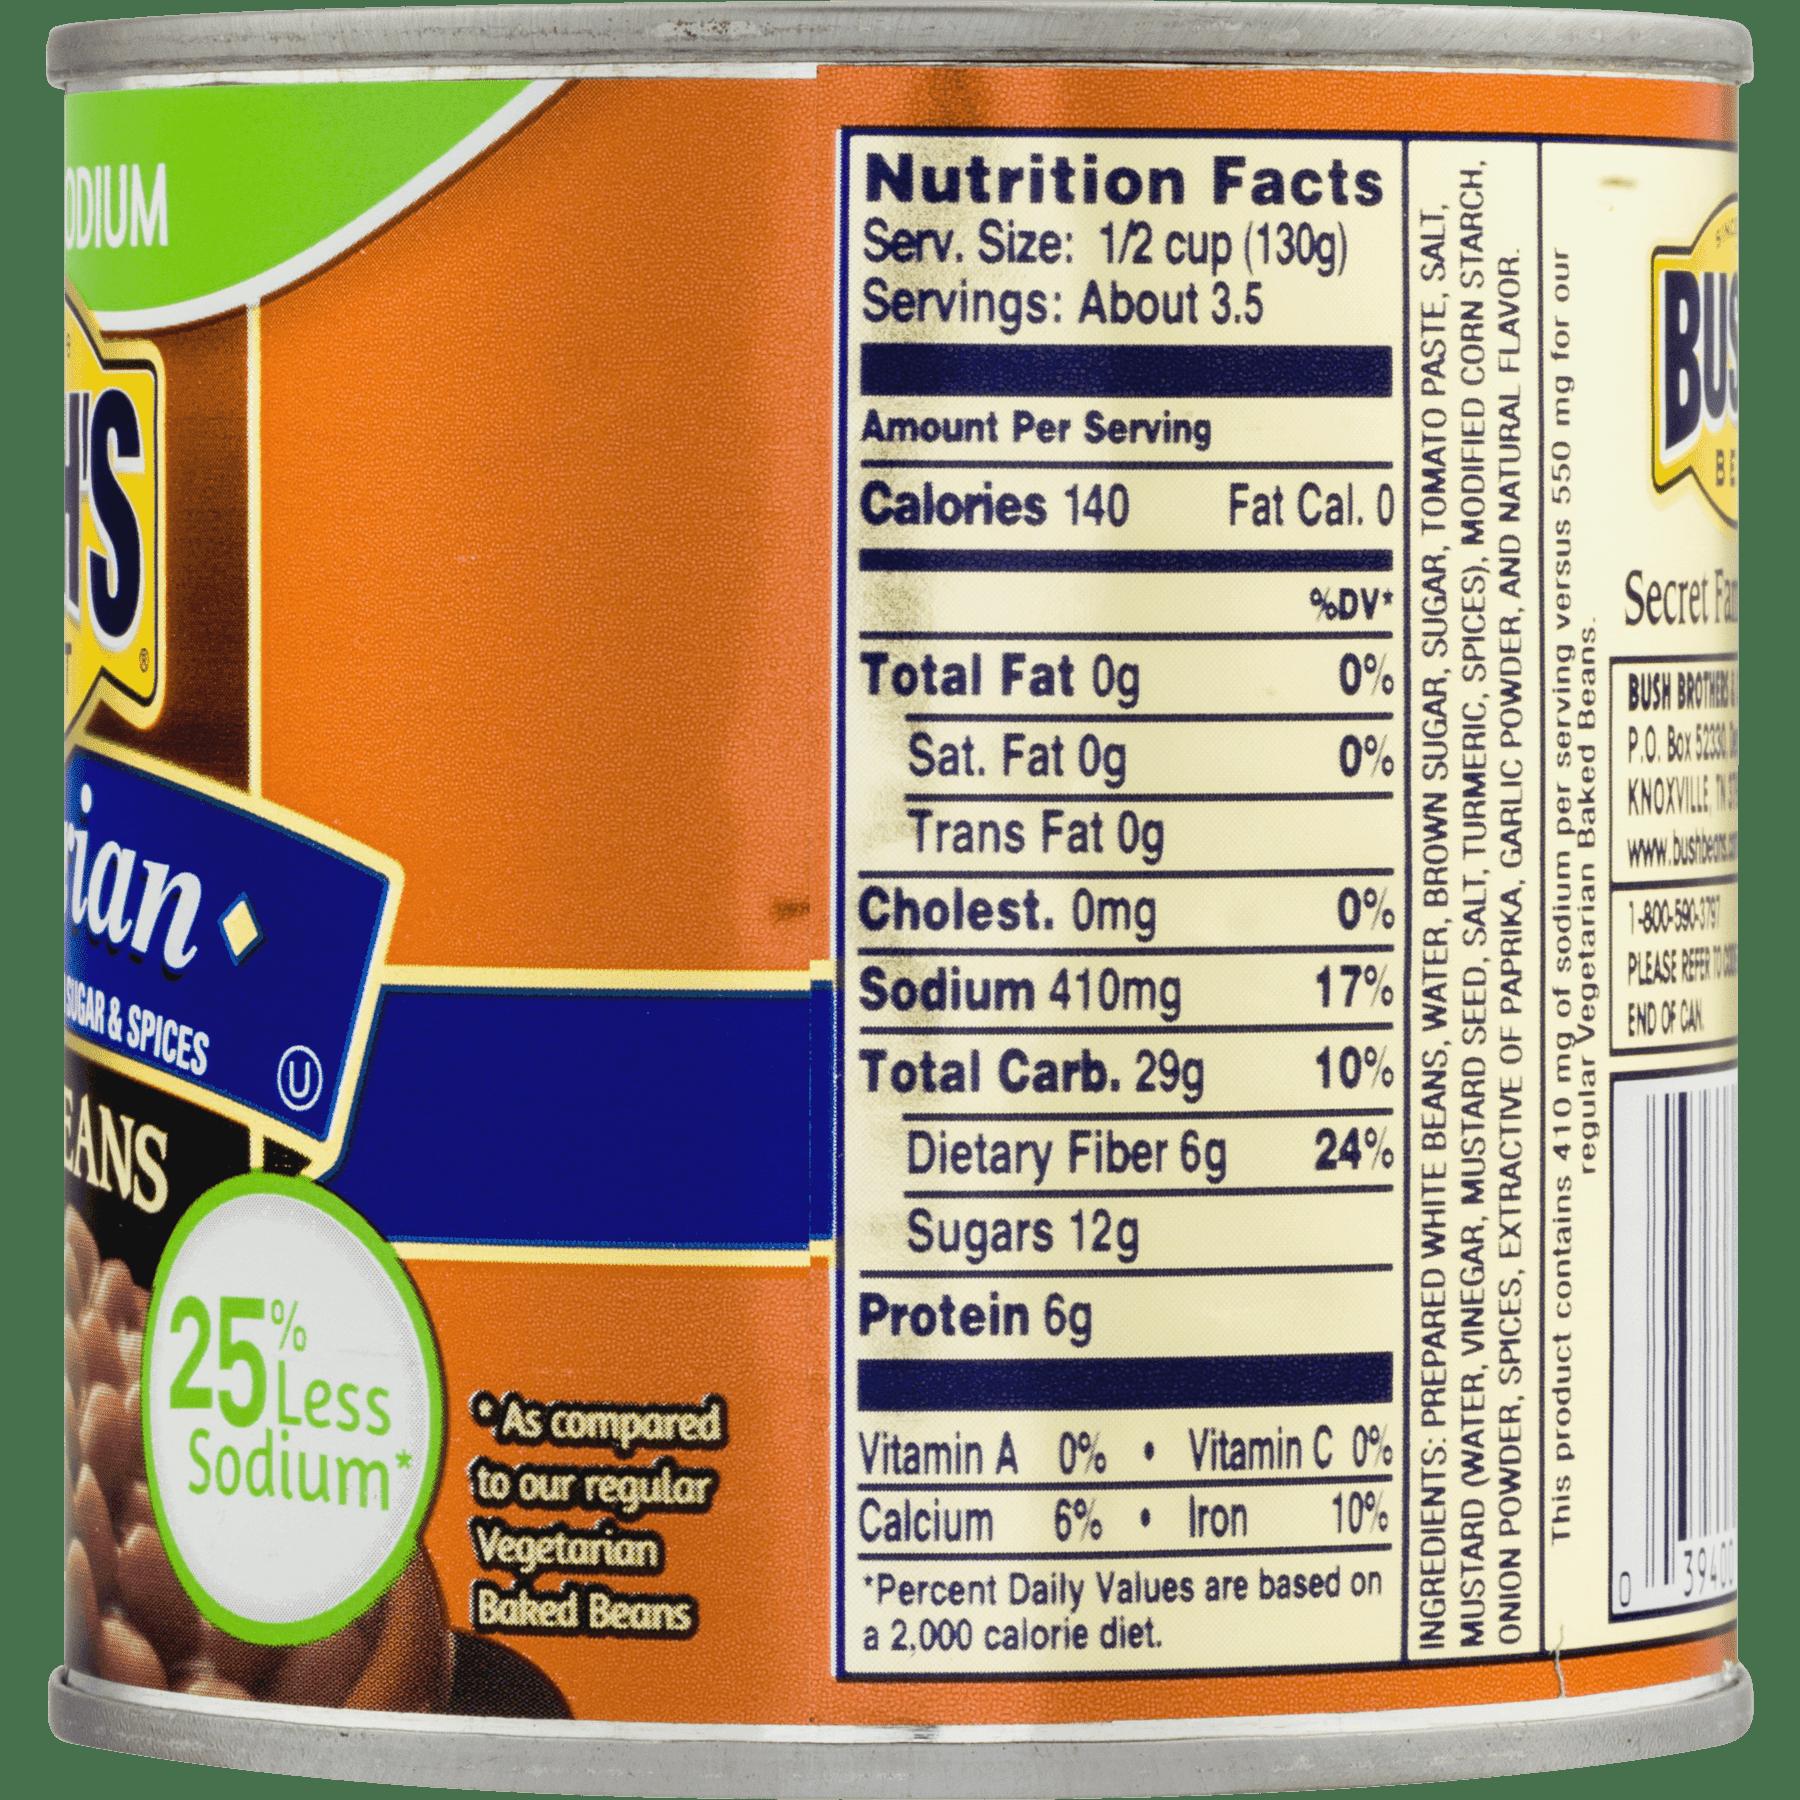 Baked Beans Nutrition Label - Labels